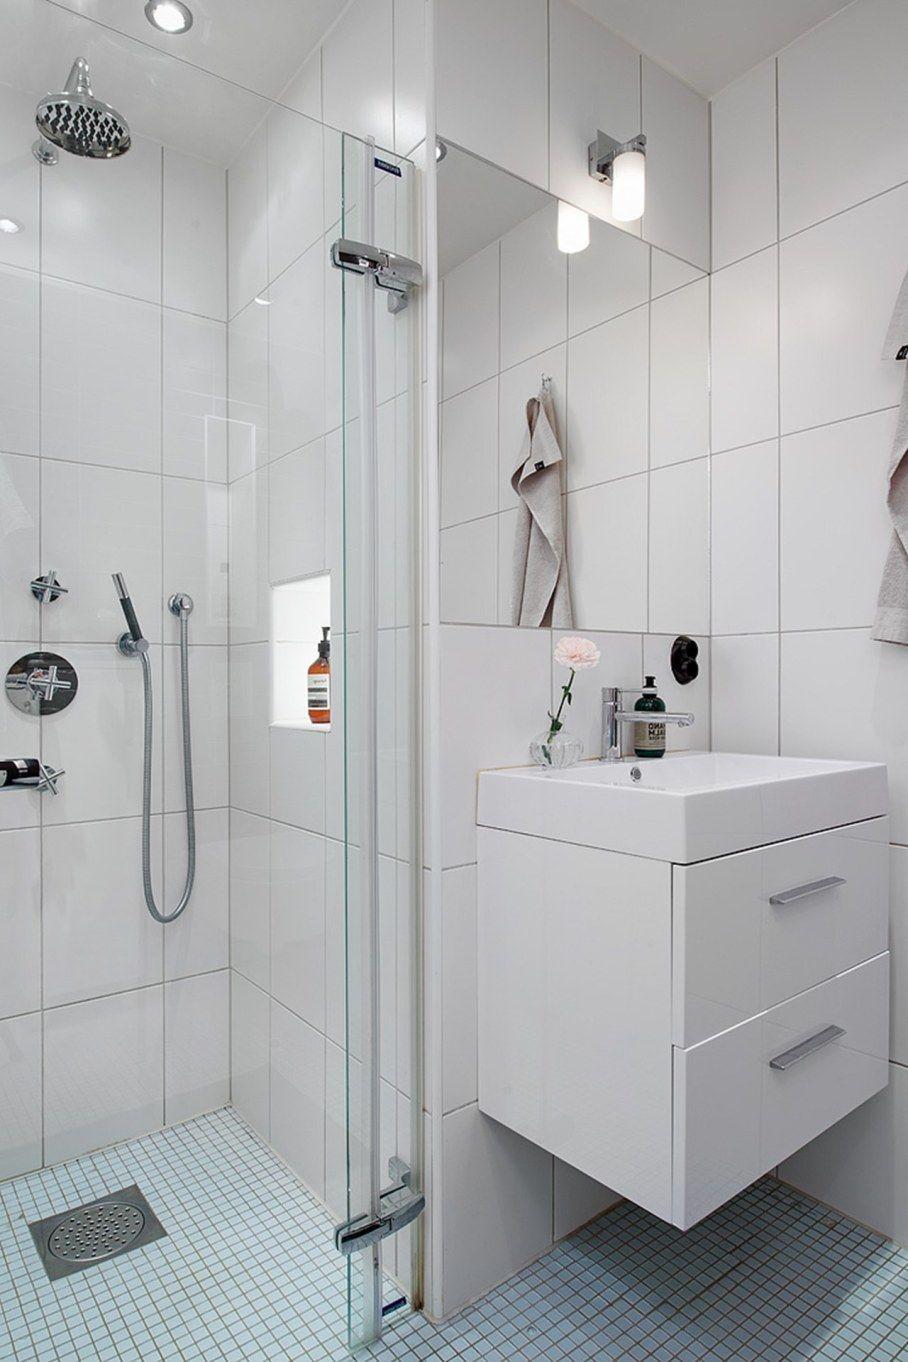 Scandinavian style interior design - bathroom | H O M E. | Pinterest ...